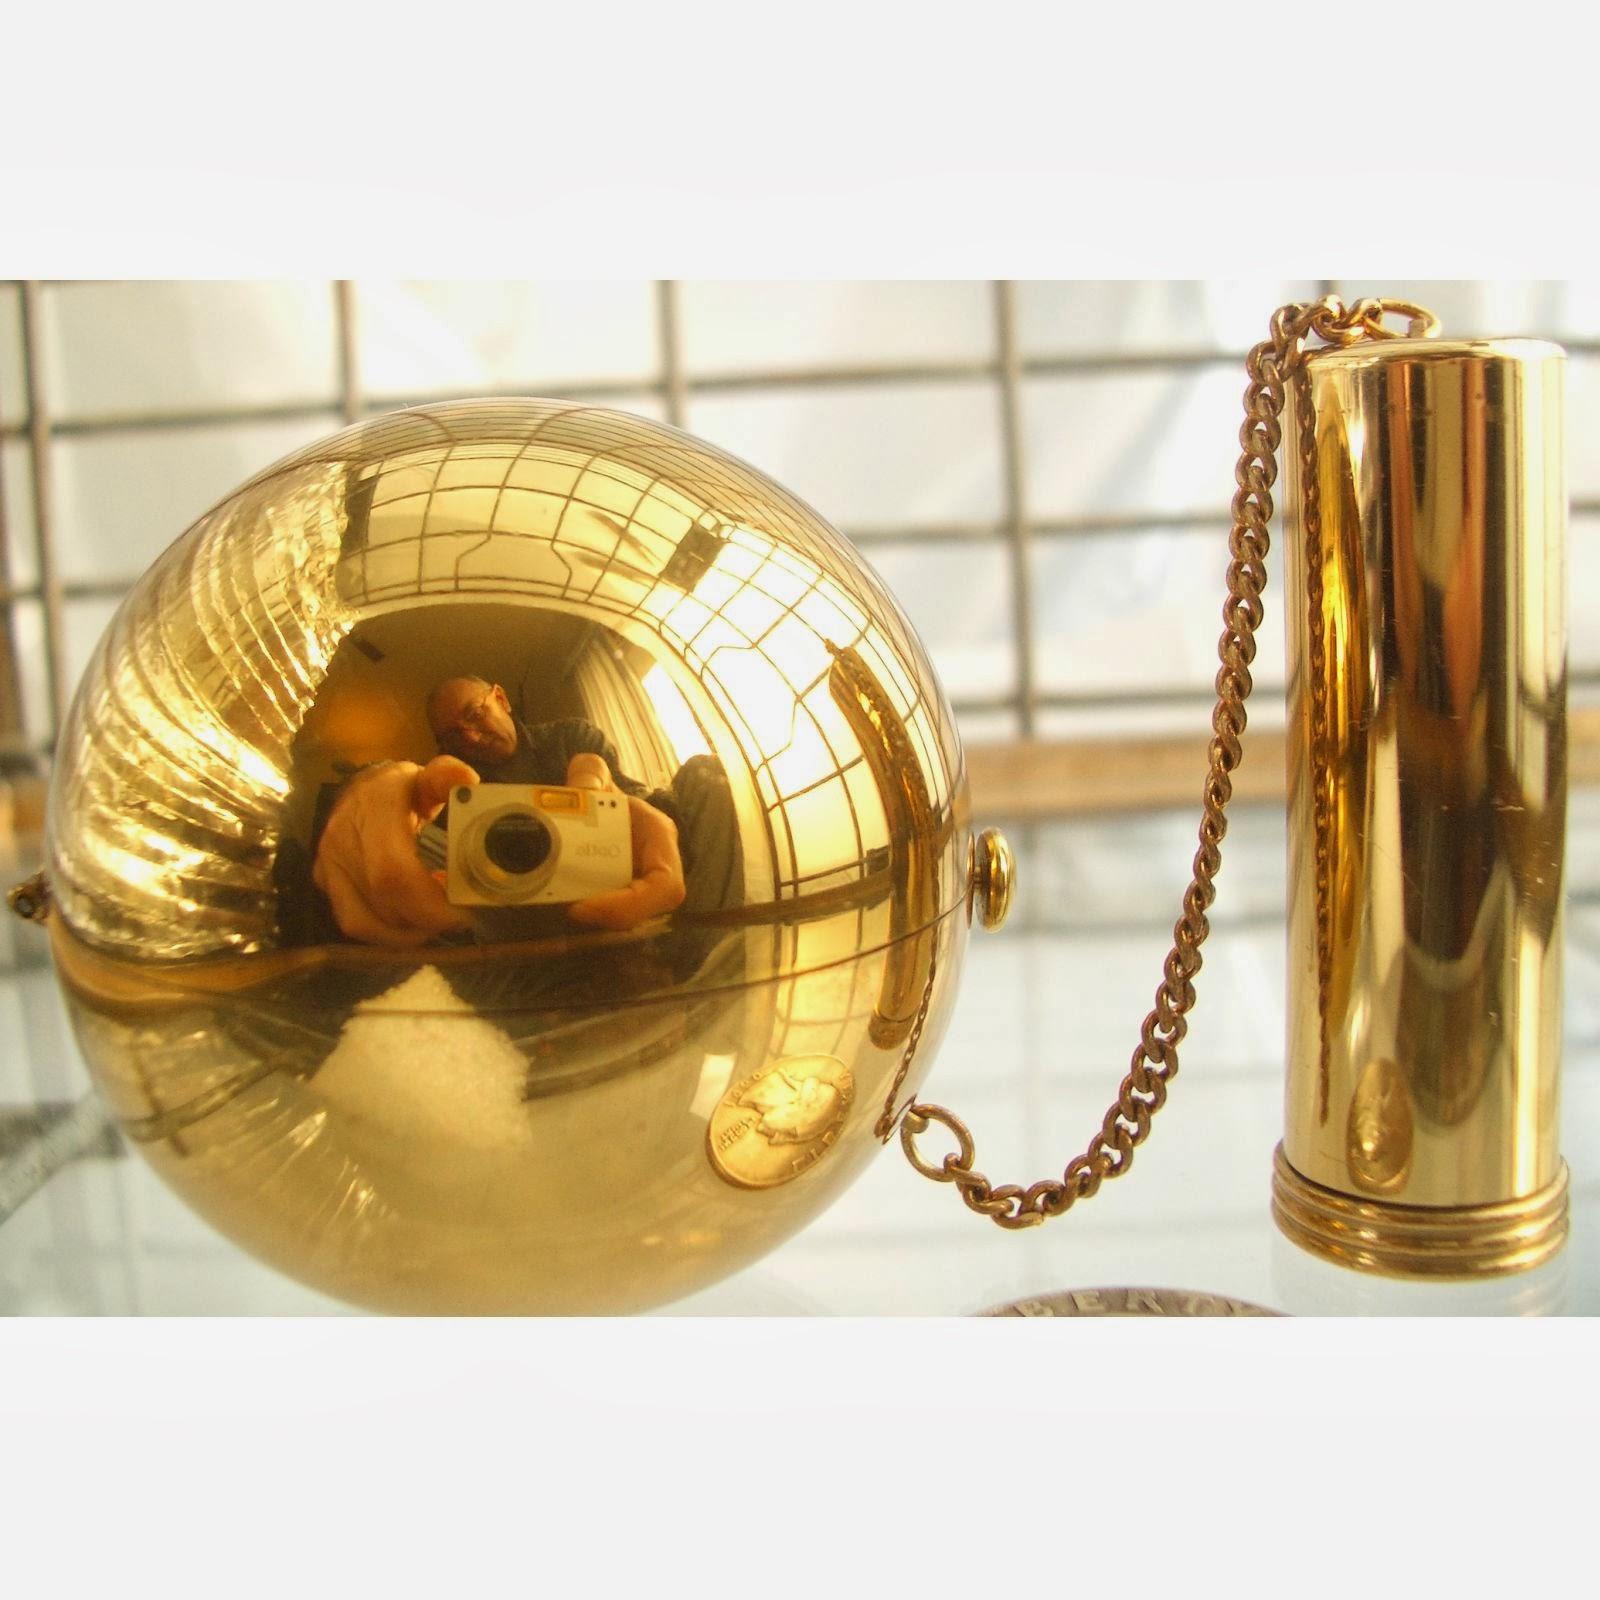 Collectibles Vintage Antique Vintage Compact Brass Sphere